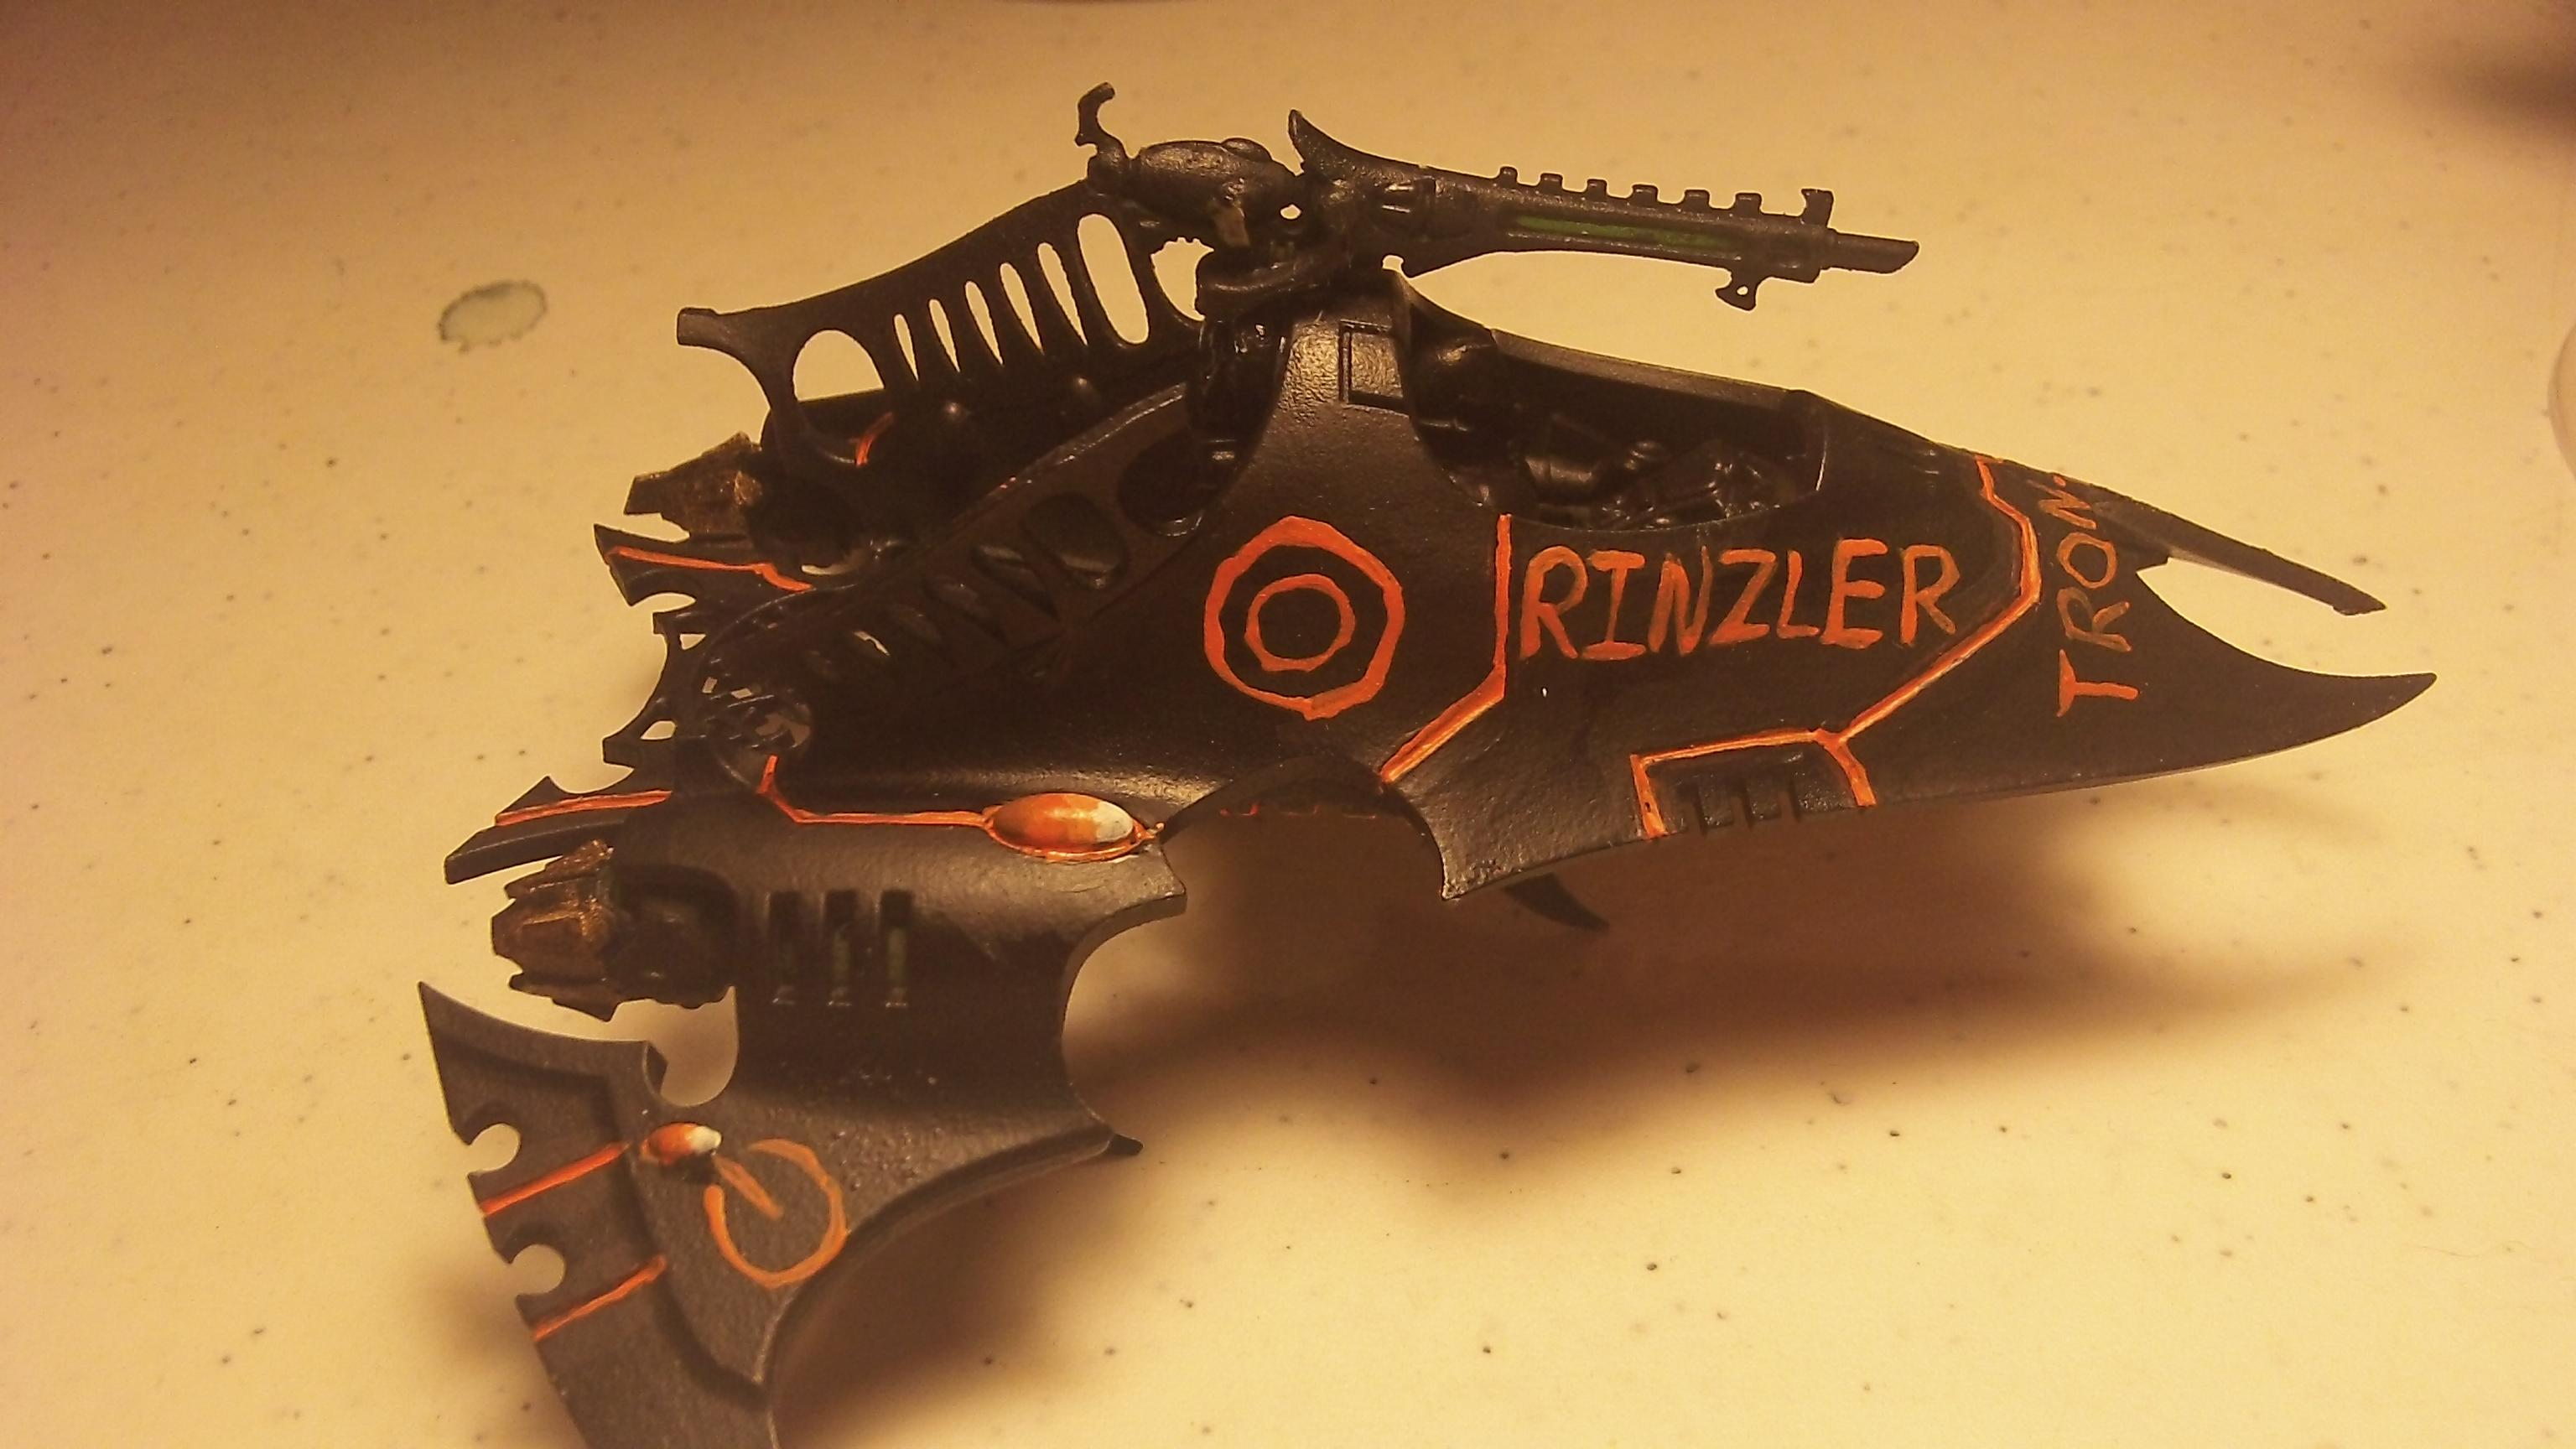 Rinzler's ride